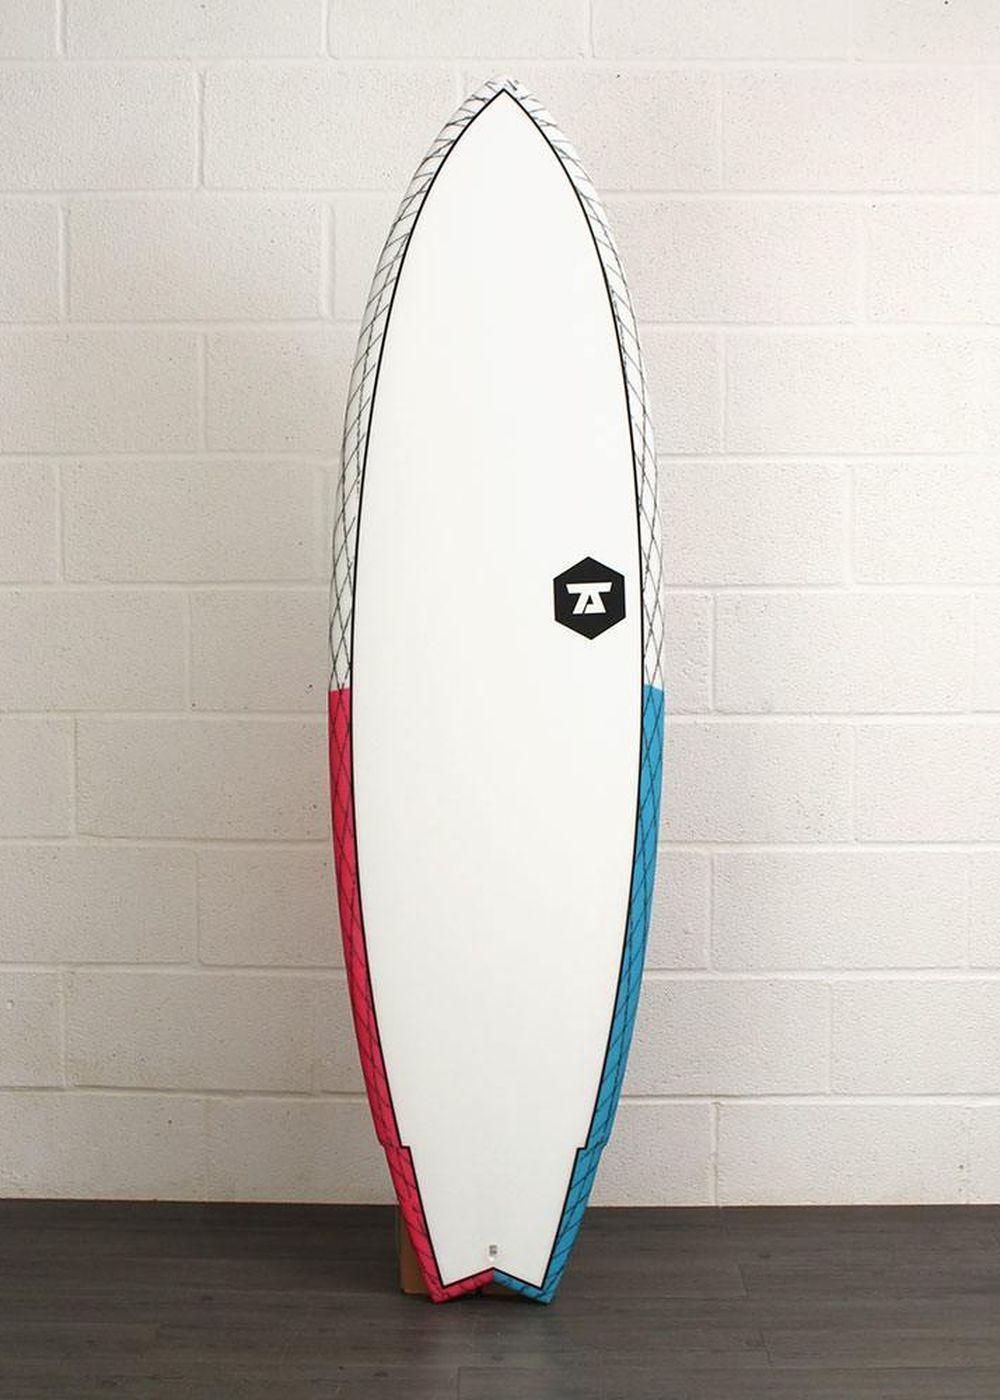 7S SUPER FISH 3 CV SURFBOARD 6ft 9 Blue/Red